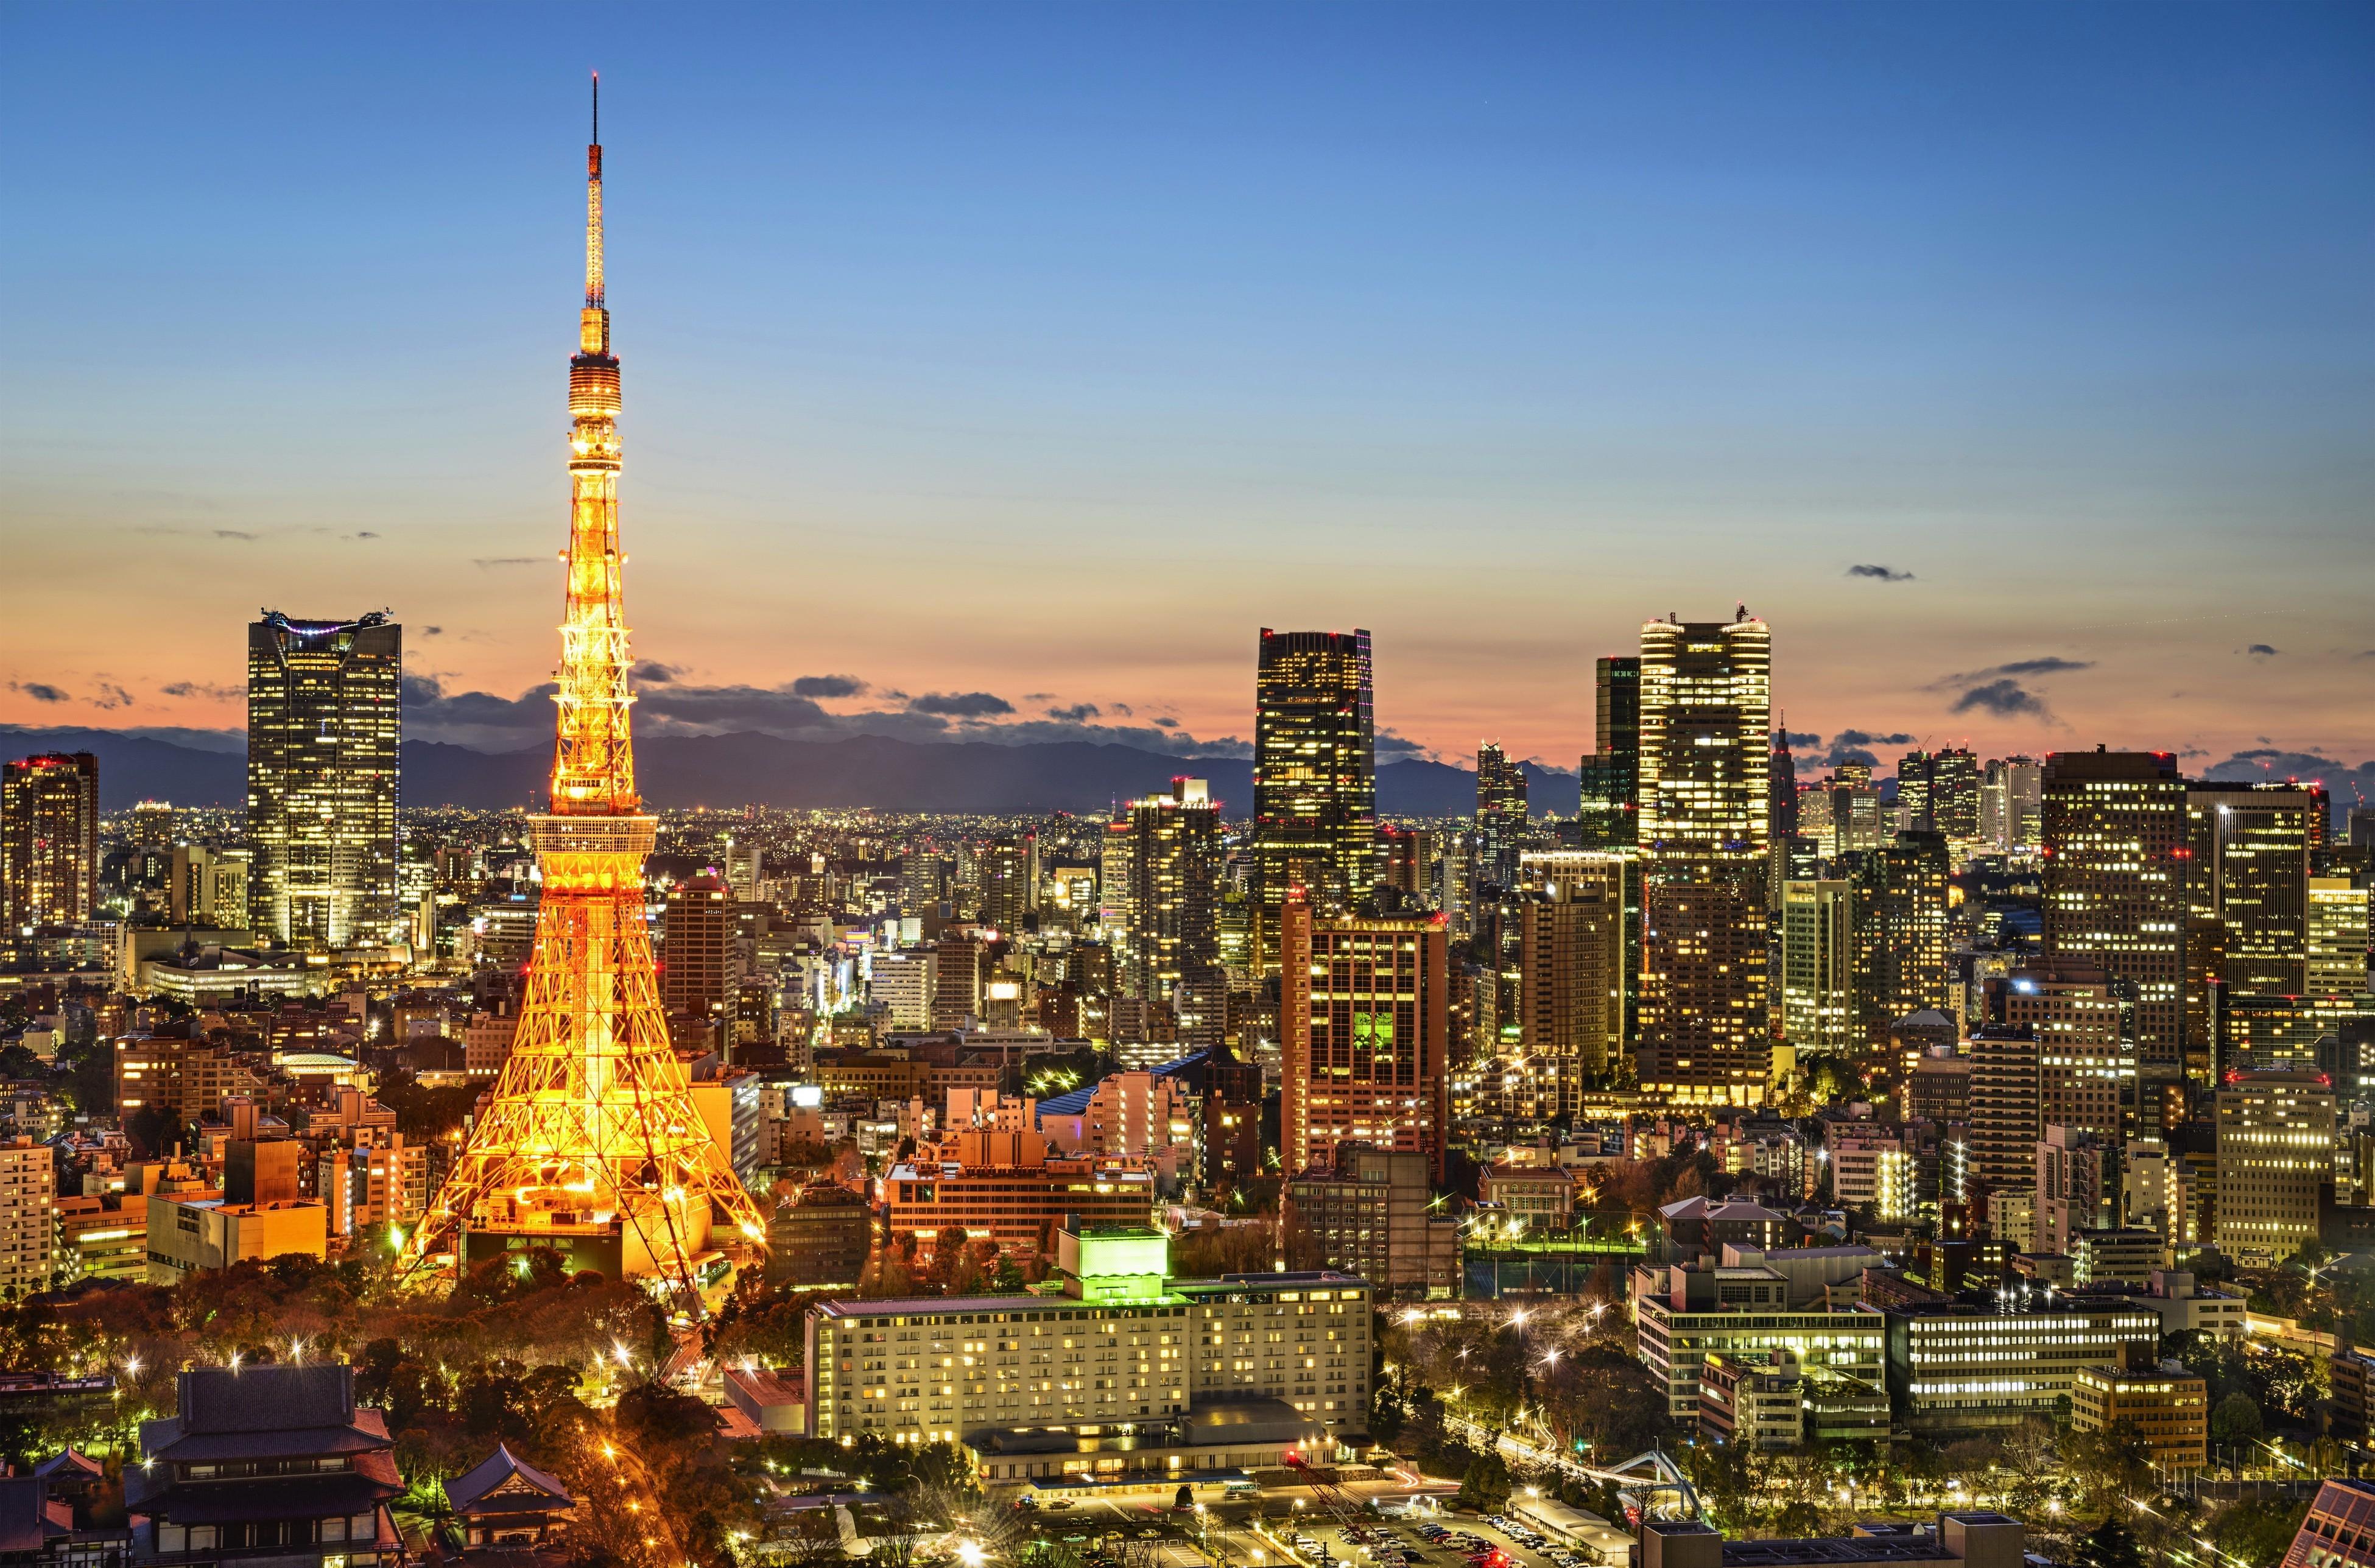 Tokyo 4k Ultra HD Wallpaper | Background Image | 3900x2575 ...